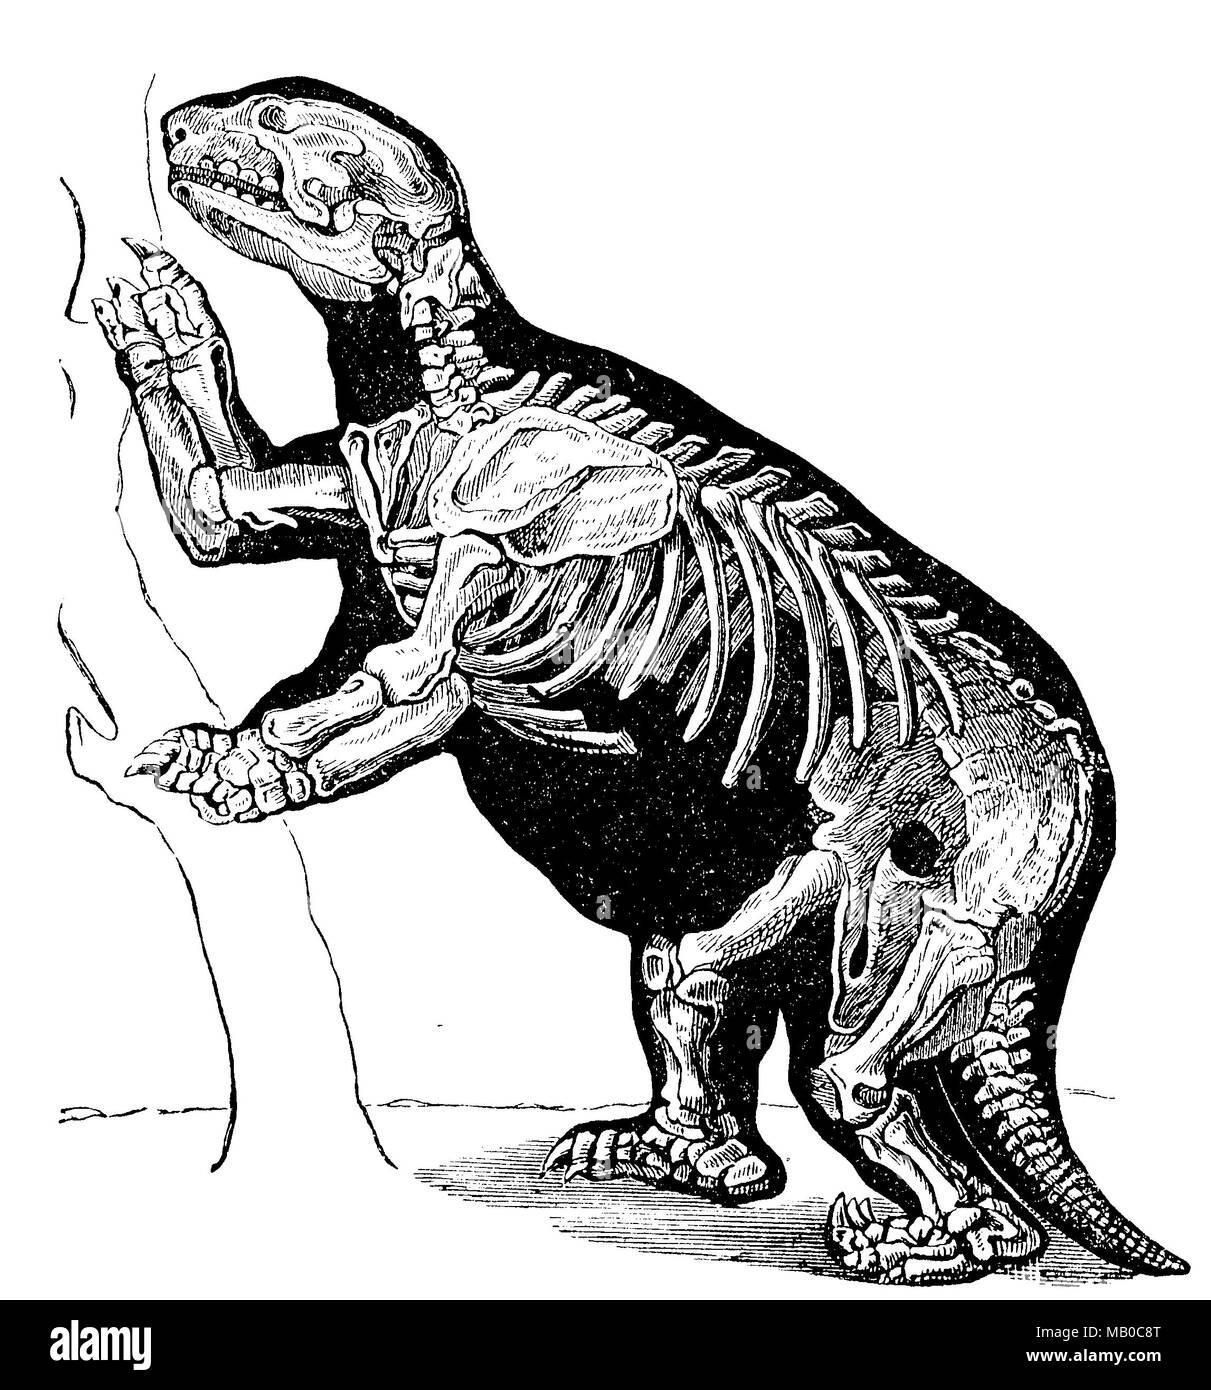 Riesenfaultier, Skelett eines Megatherium americanum, ausgestorben. giant sloth, skeleton of a megatherium americanum, extinct, digital improved reproduction of an original print from the year 1895 - Stock Image